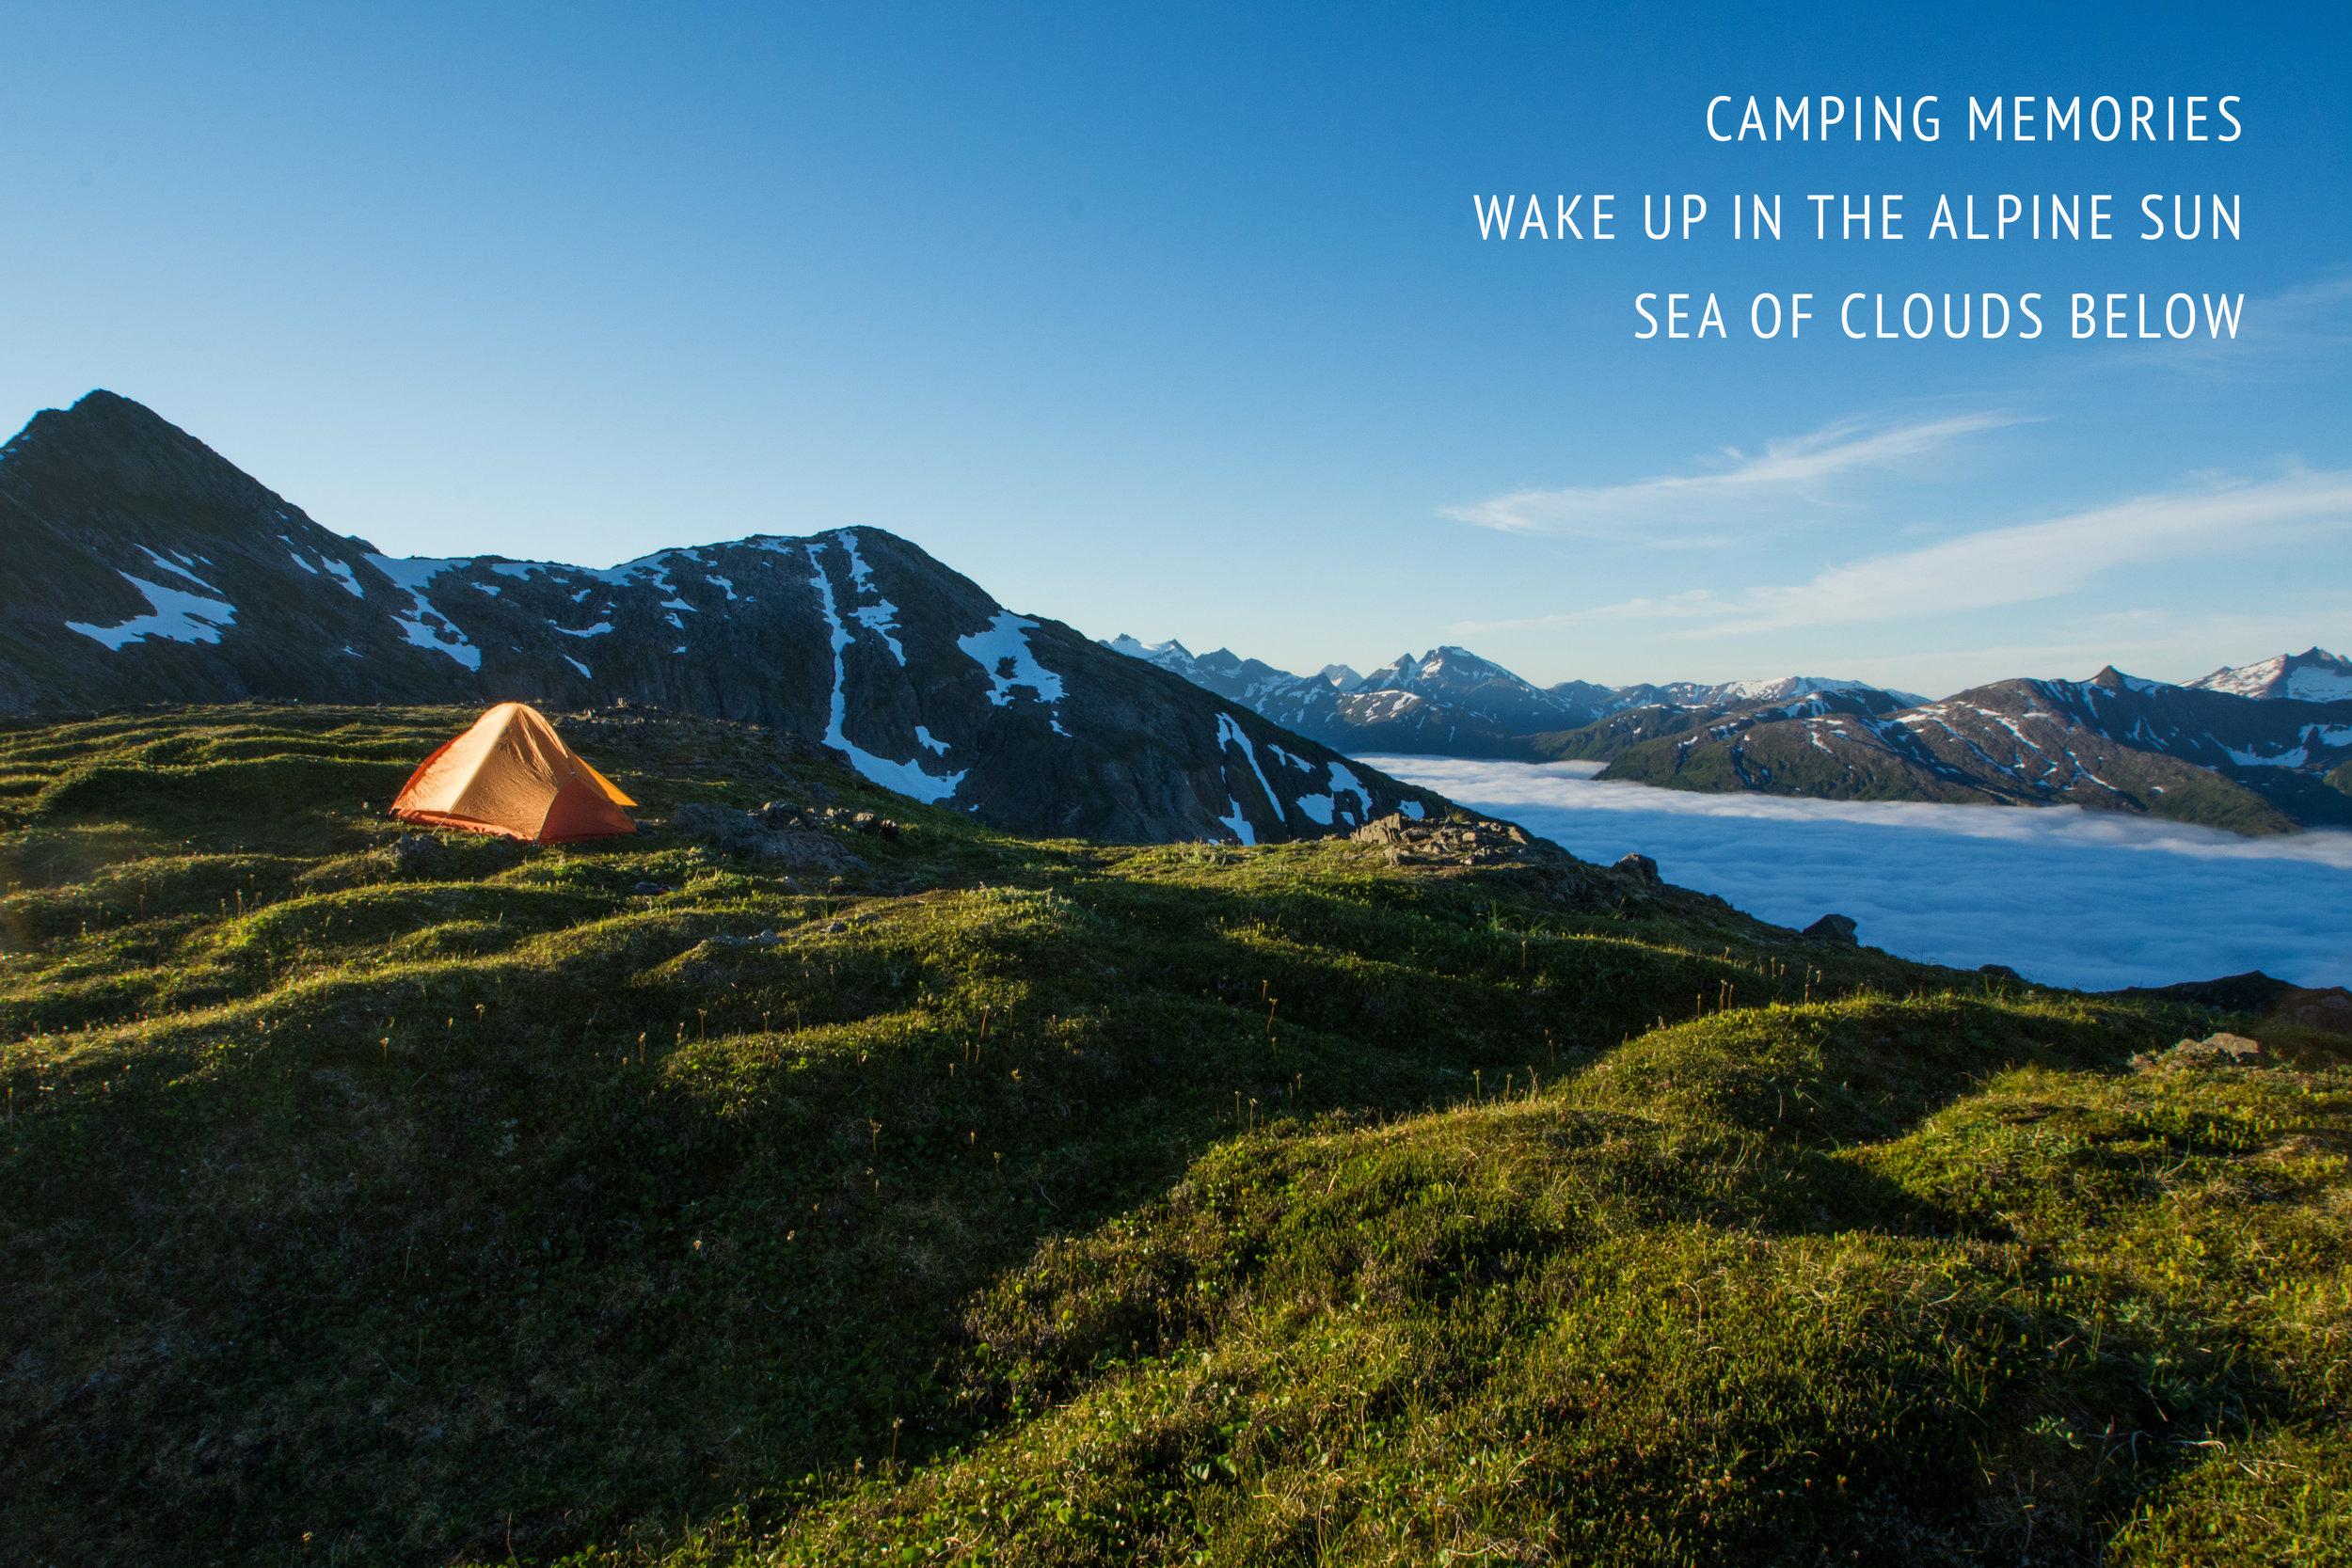 alpinecamphaiku.jpg